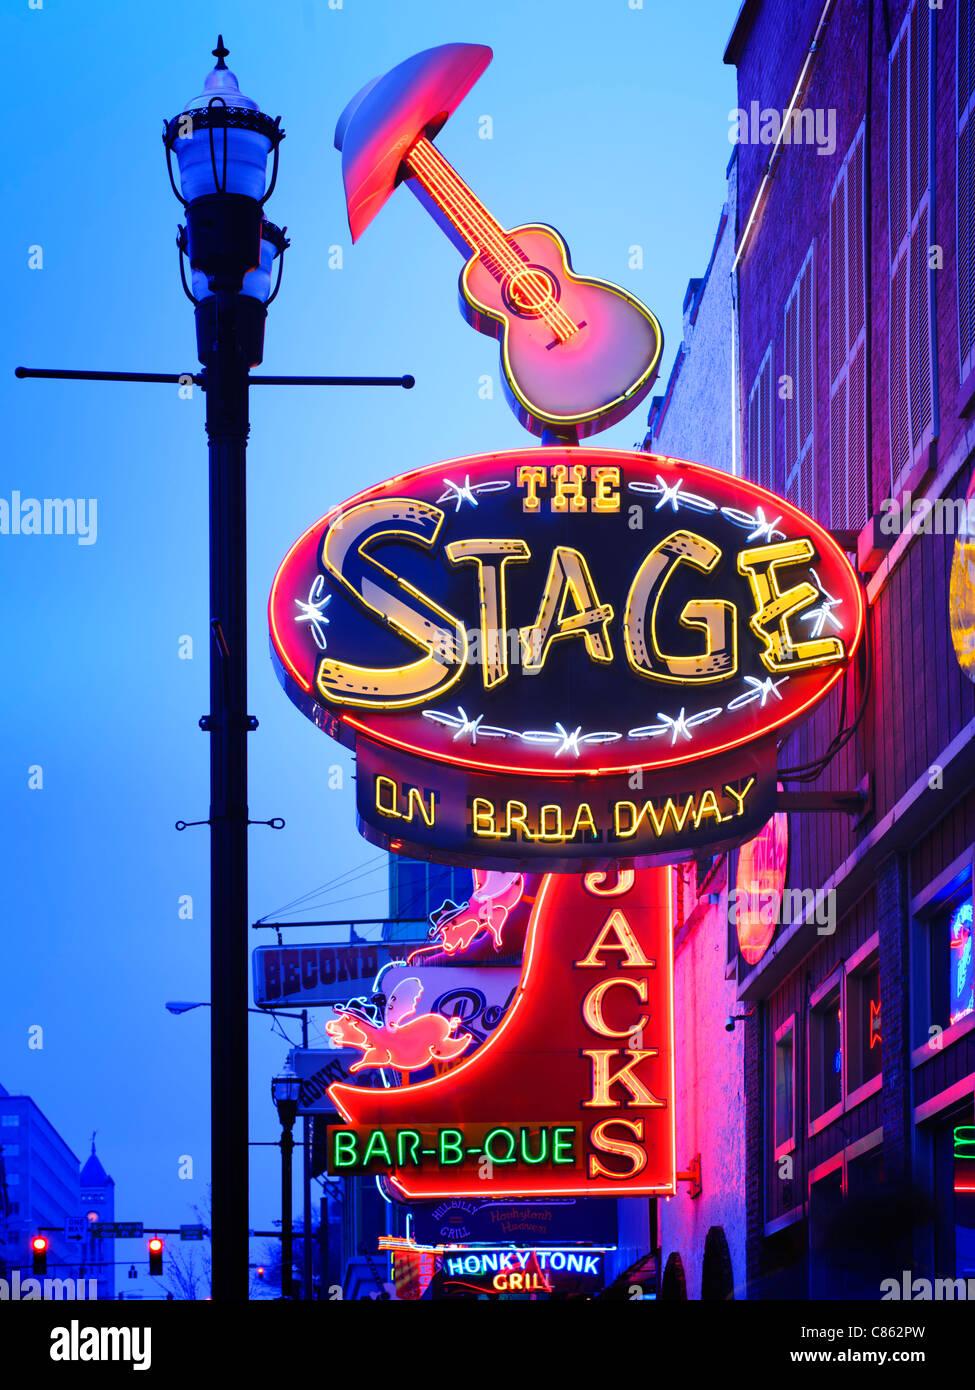 Stage Live music venue Lower Broadway Nashville - Stock Image